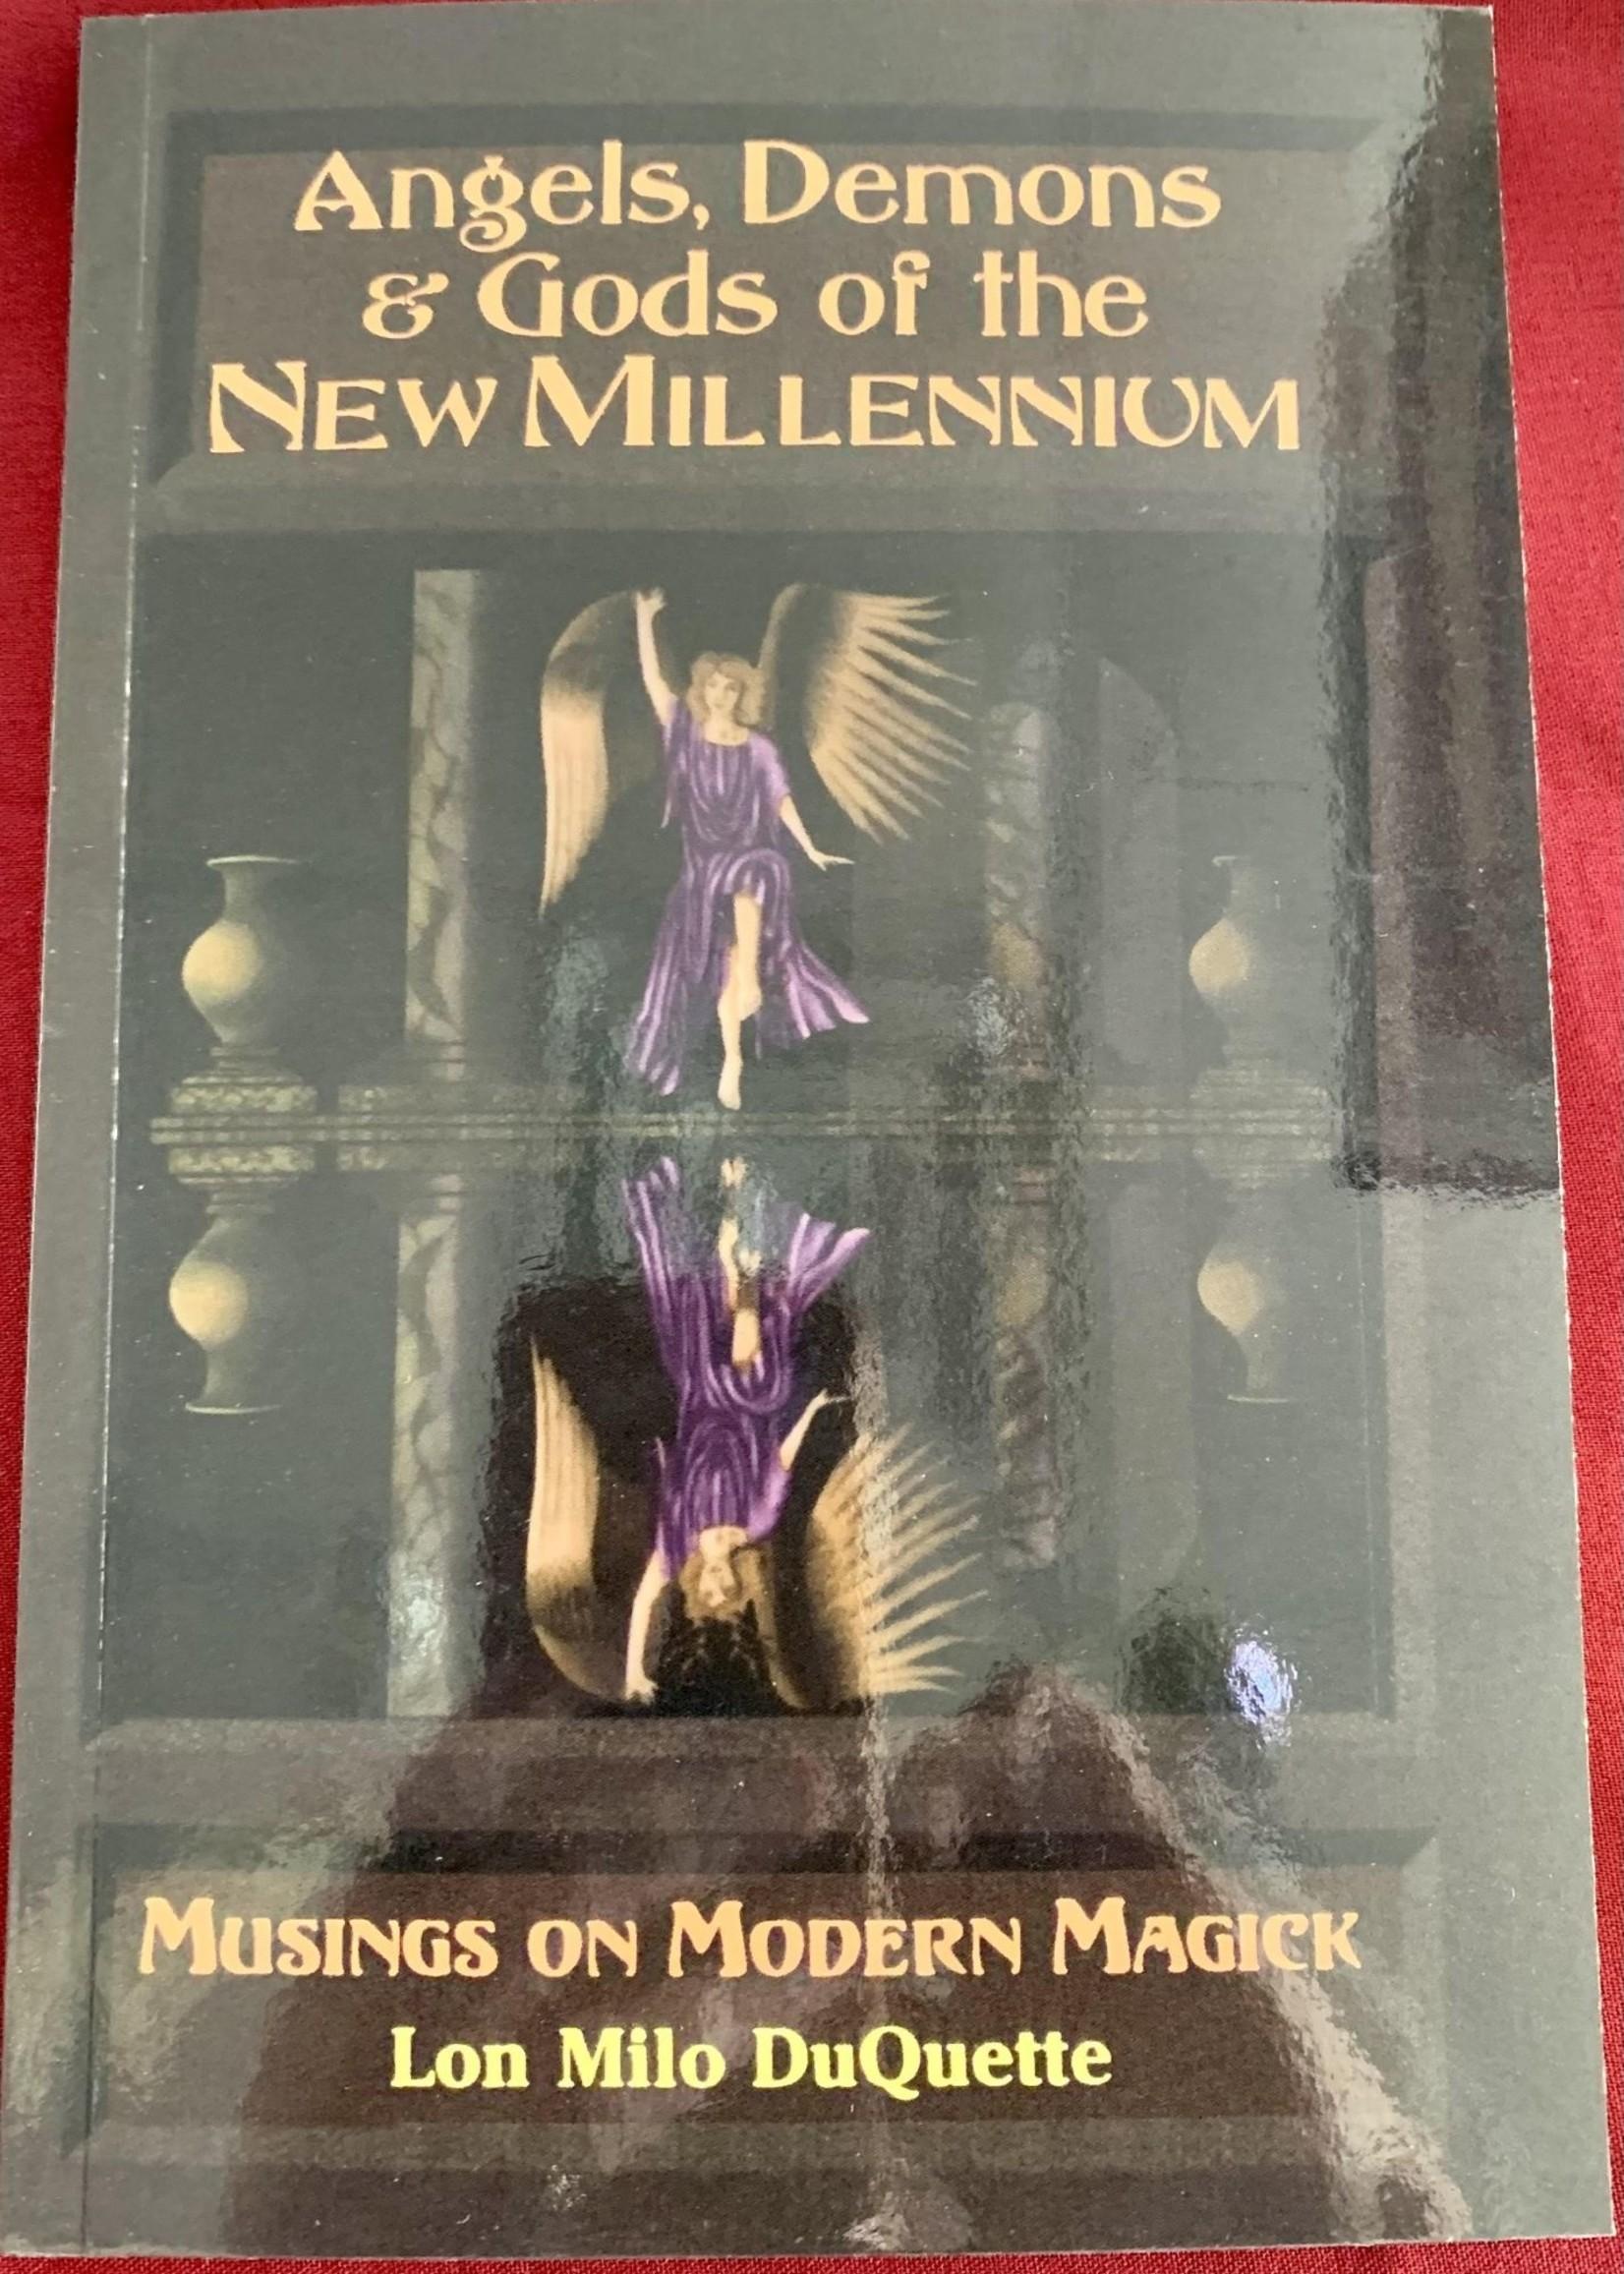 Angels, Demons & Gods of the New Millennium Musings on Modern Magick - Lon Milo DuQuette